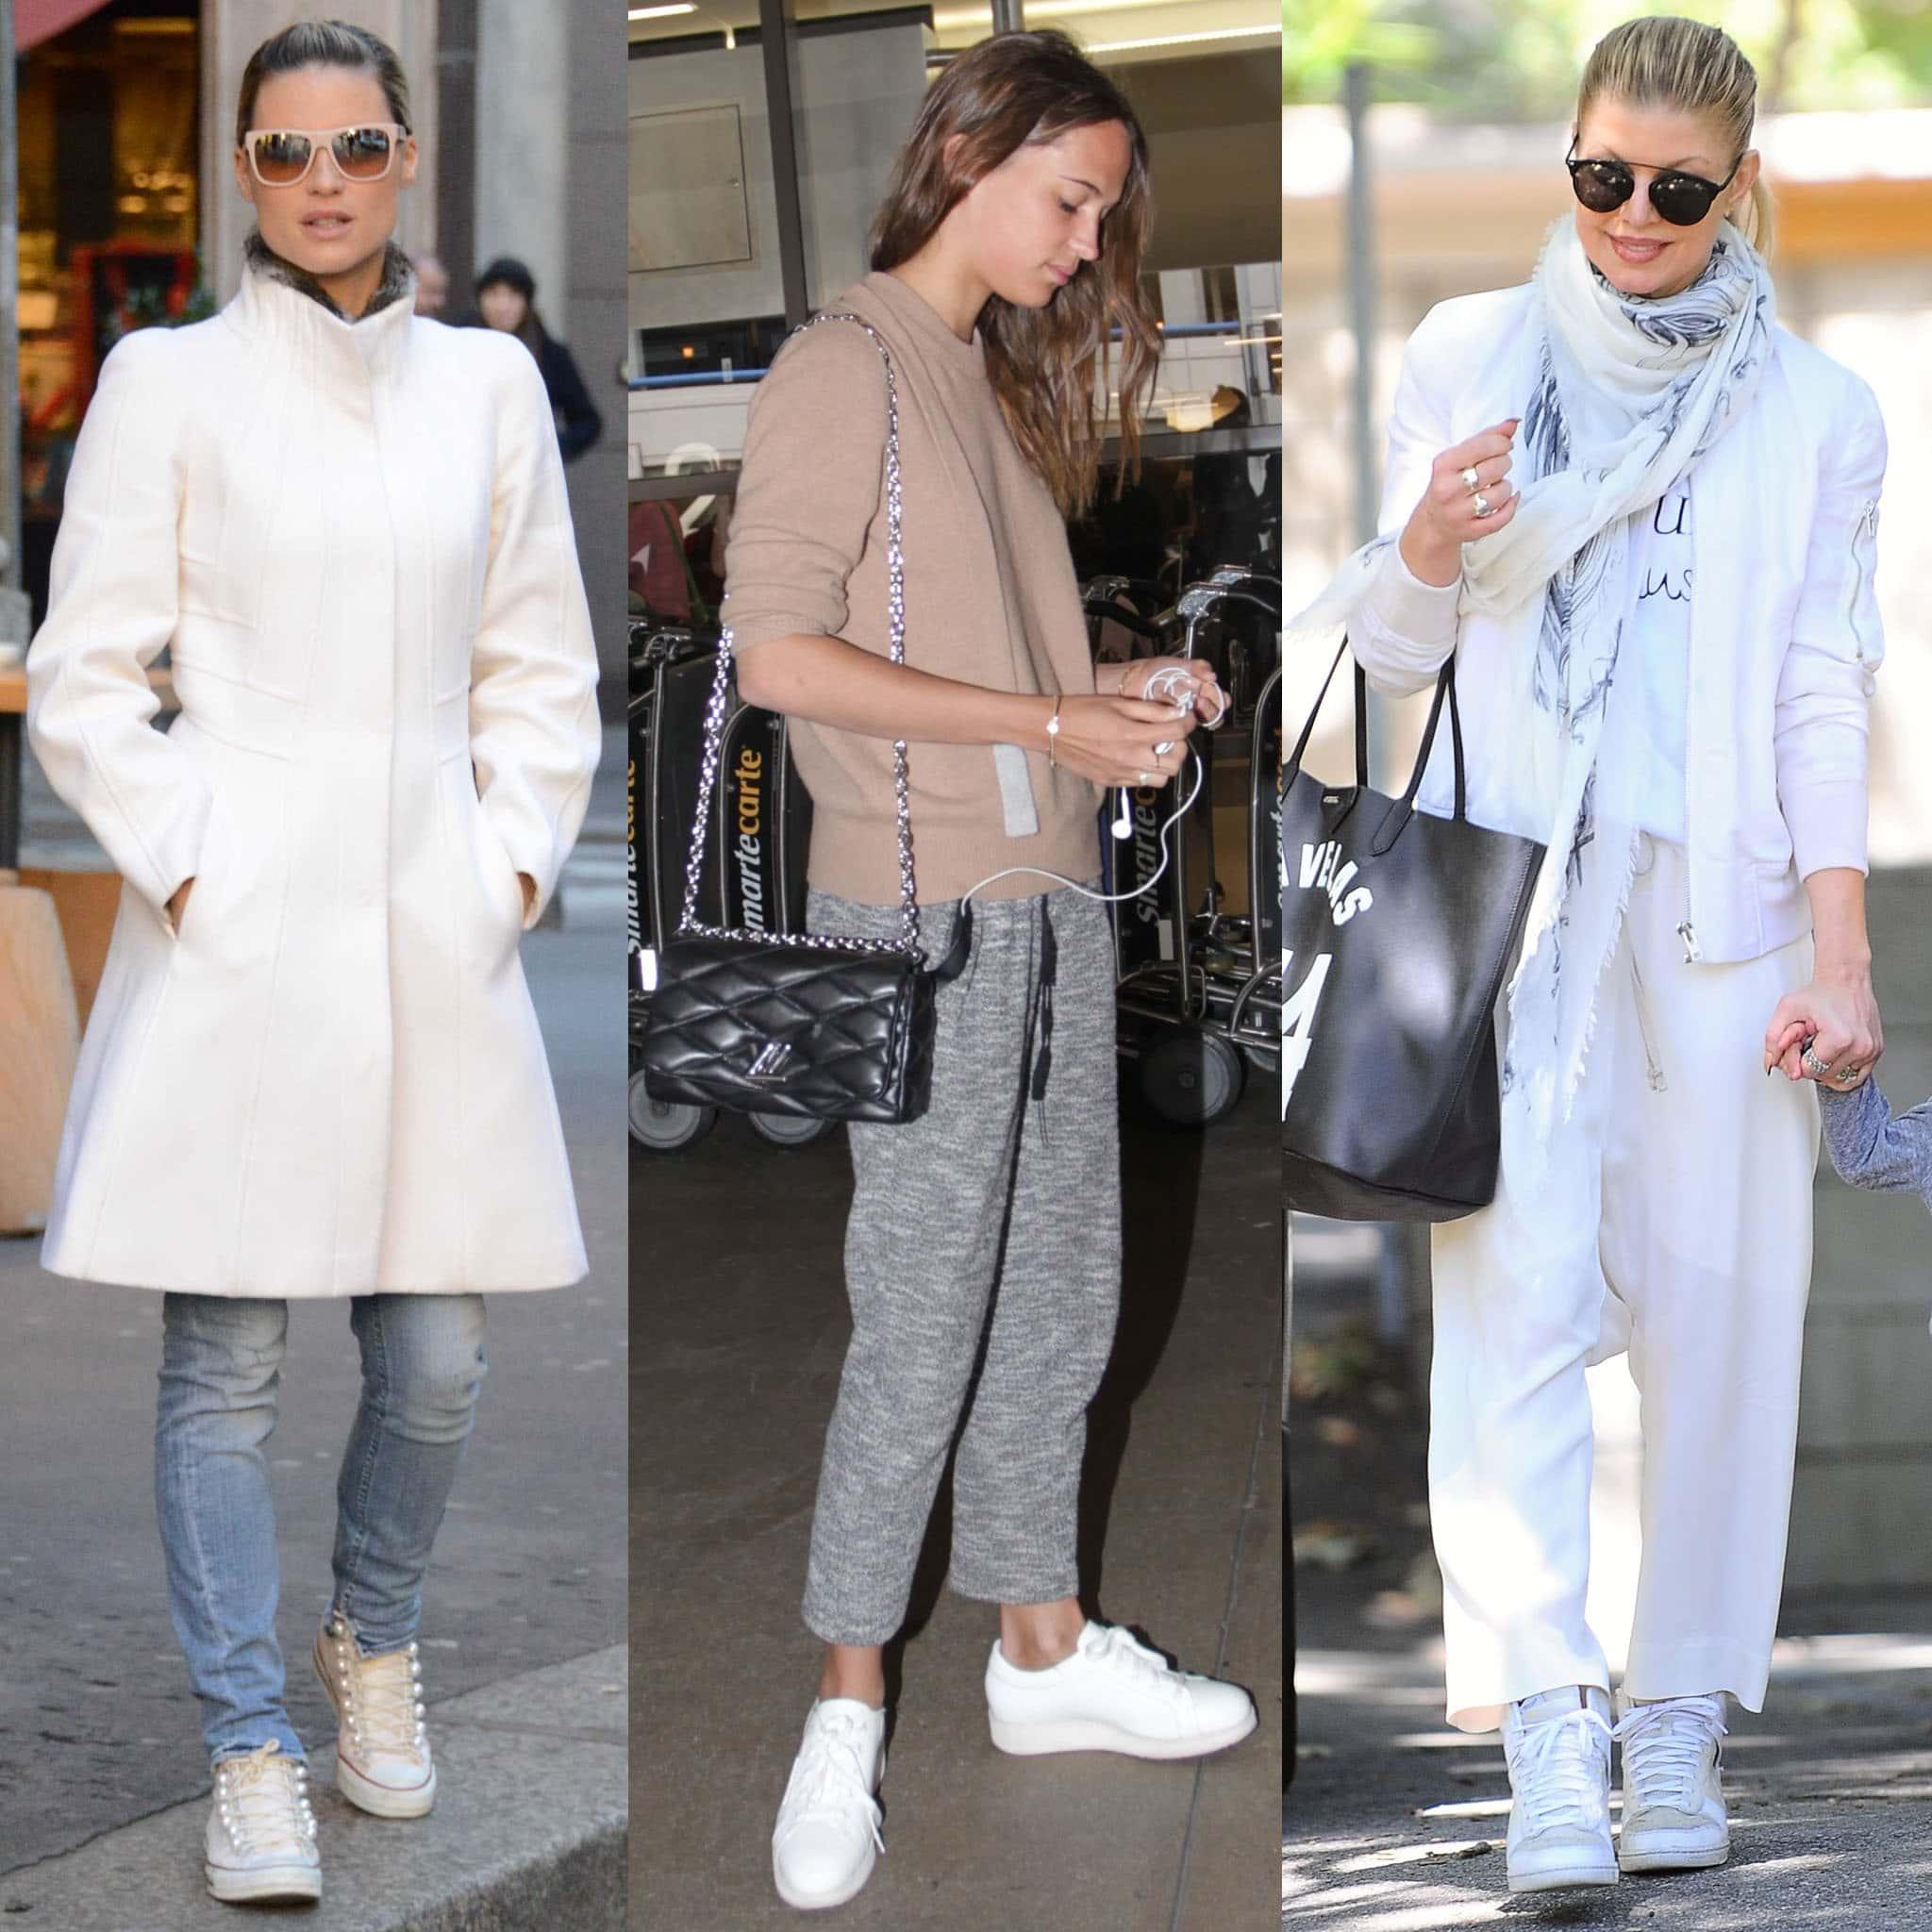 Michelle Hunziker, Alicia Vikander, and Fergie wears white sneakers in fall